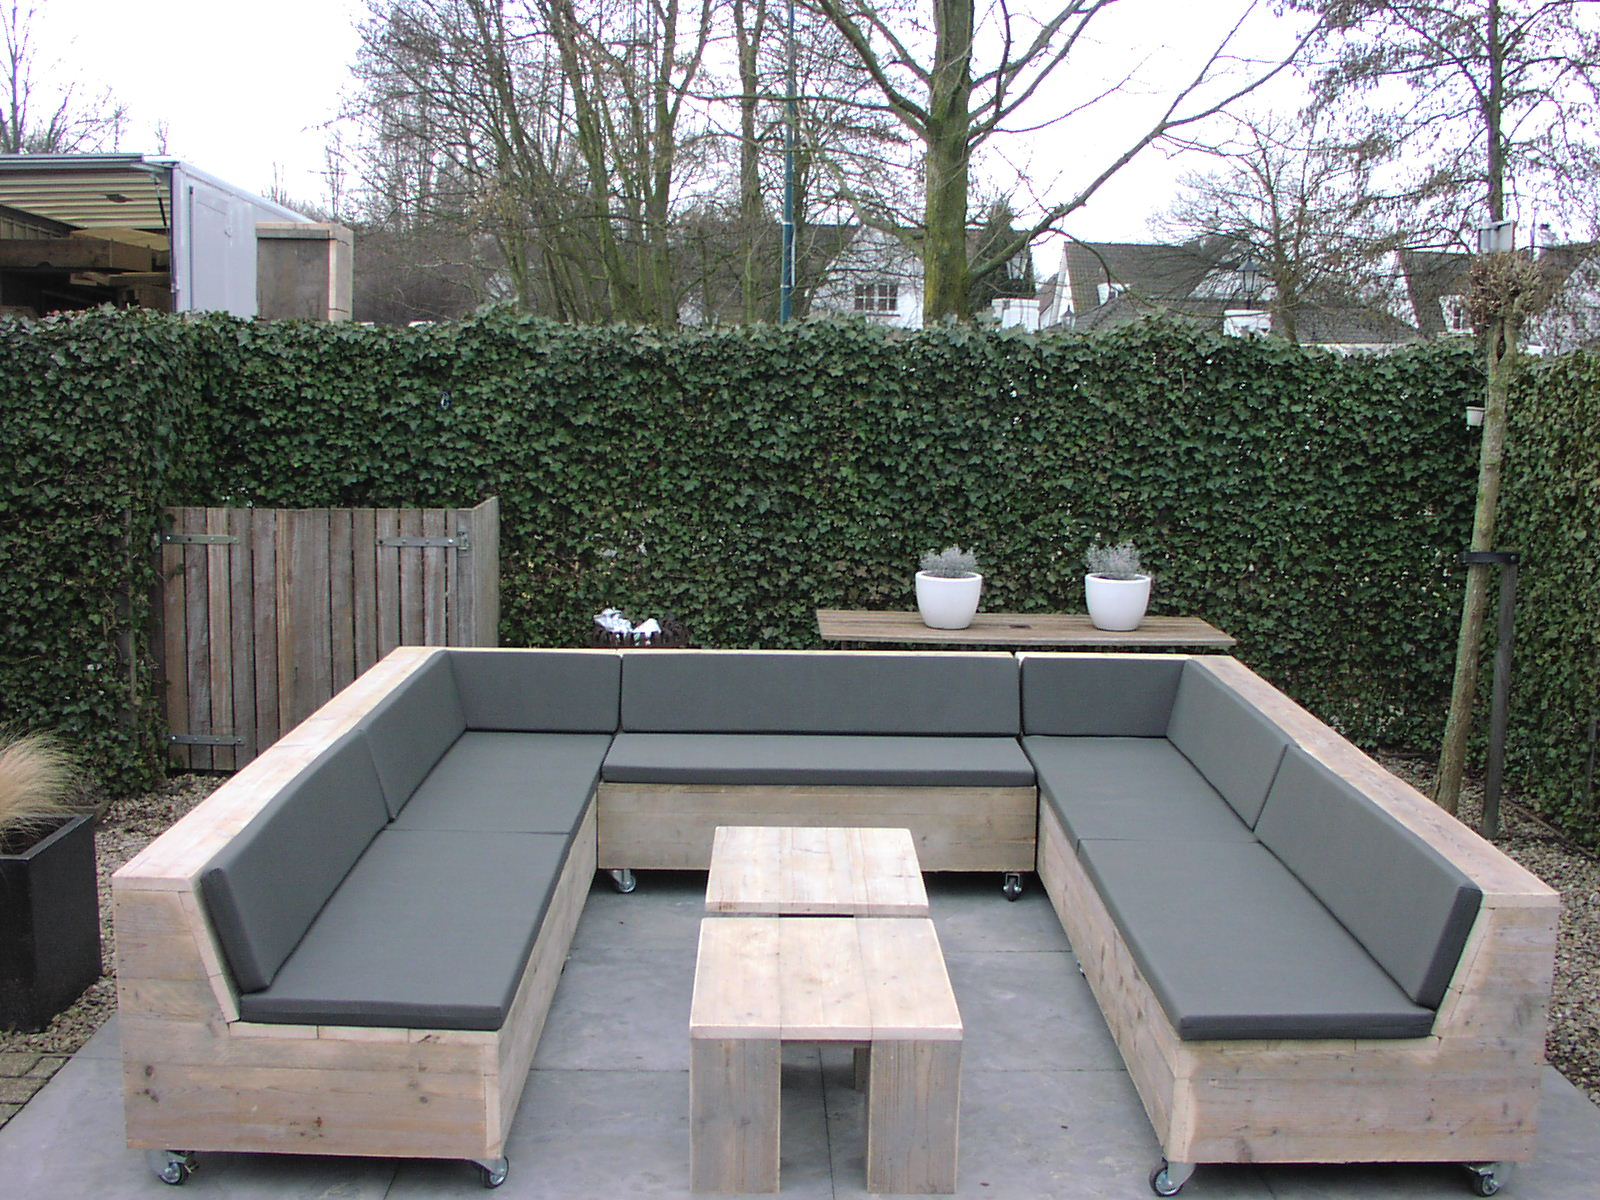 Gave steigerhouten loungebank en loungeset - Bank terras hout ...